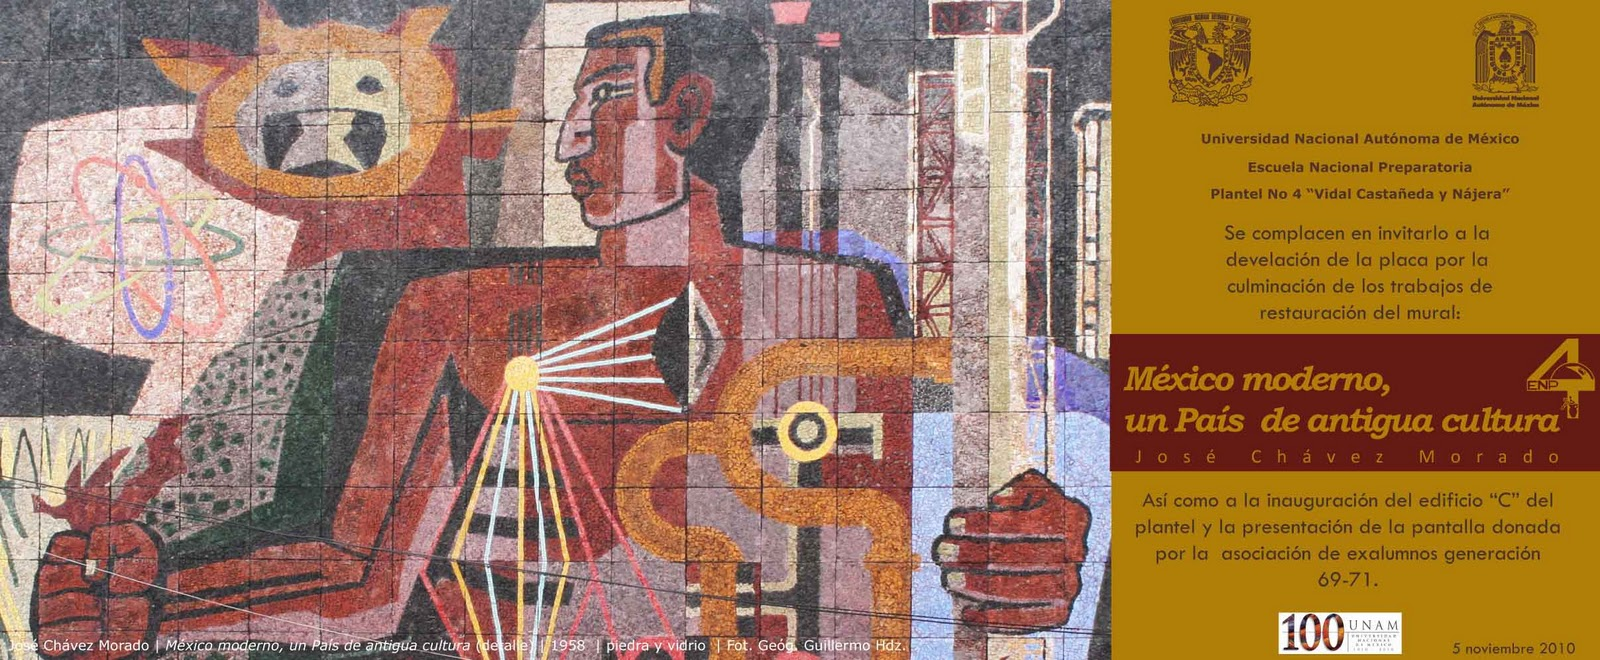 Blog prepa 4 vista del rector jos ram n narro robles for Mural prepa 1 uaemex